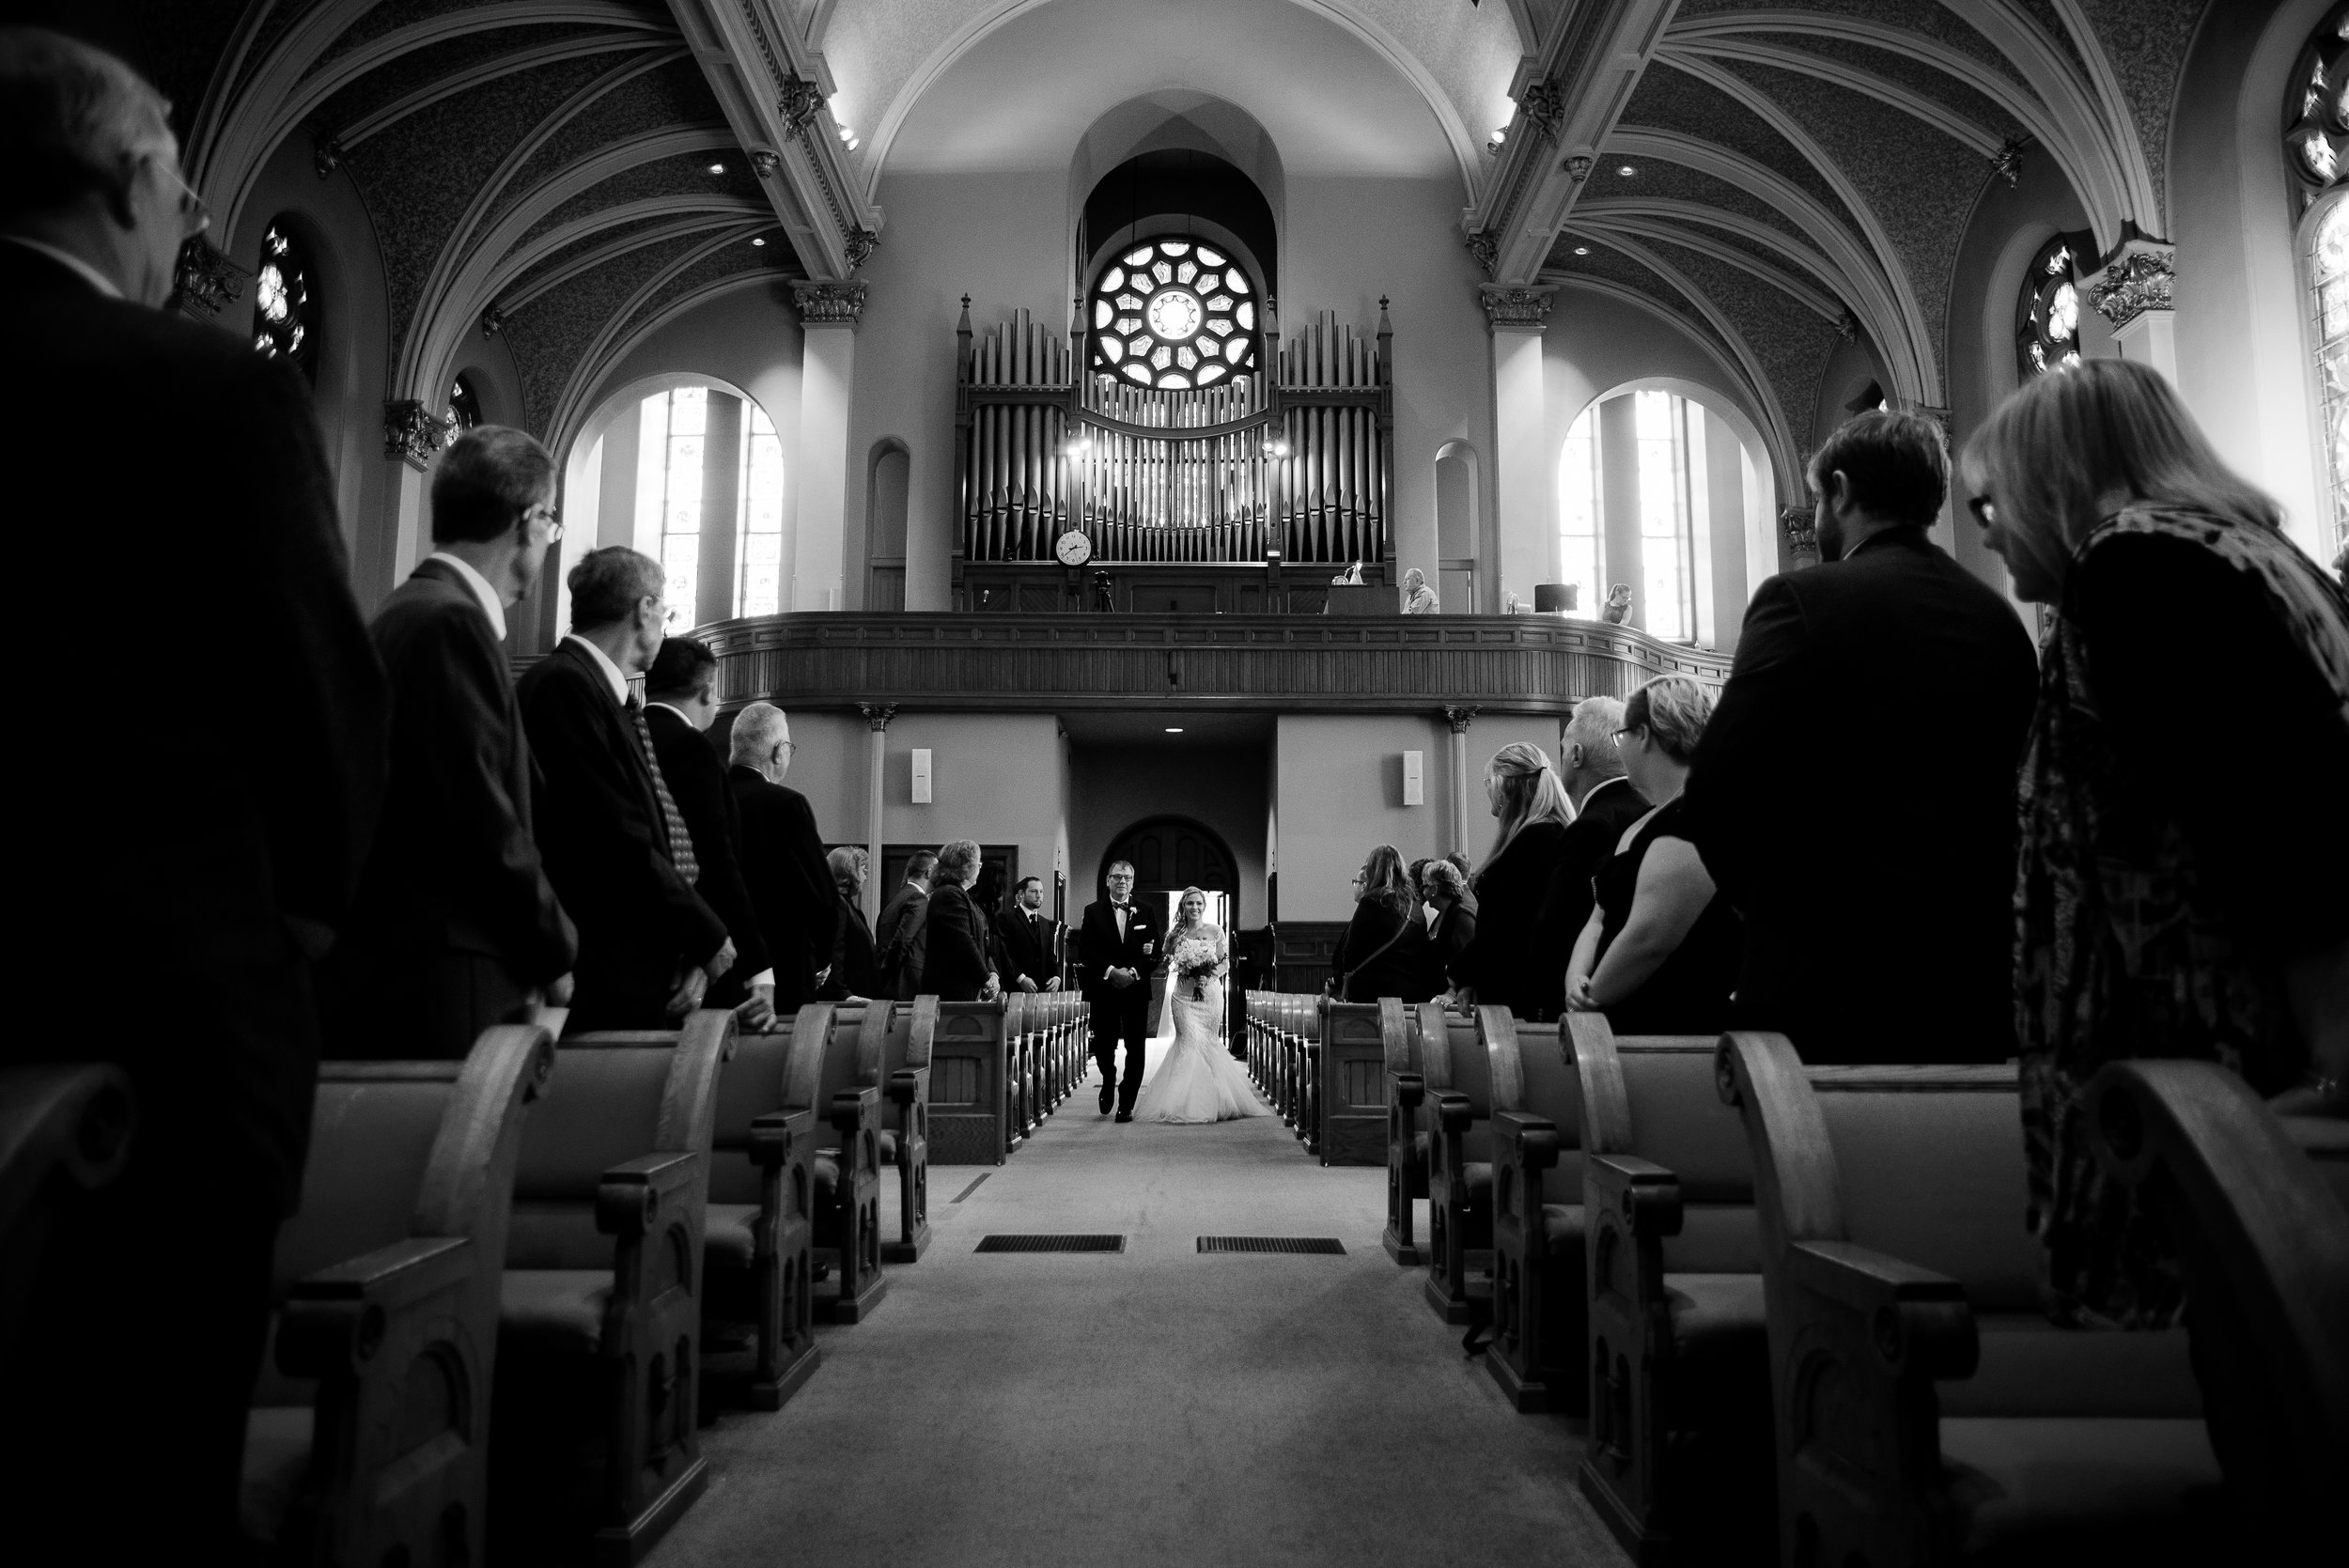 williamsport-wedding (2).jpg